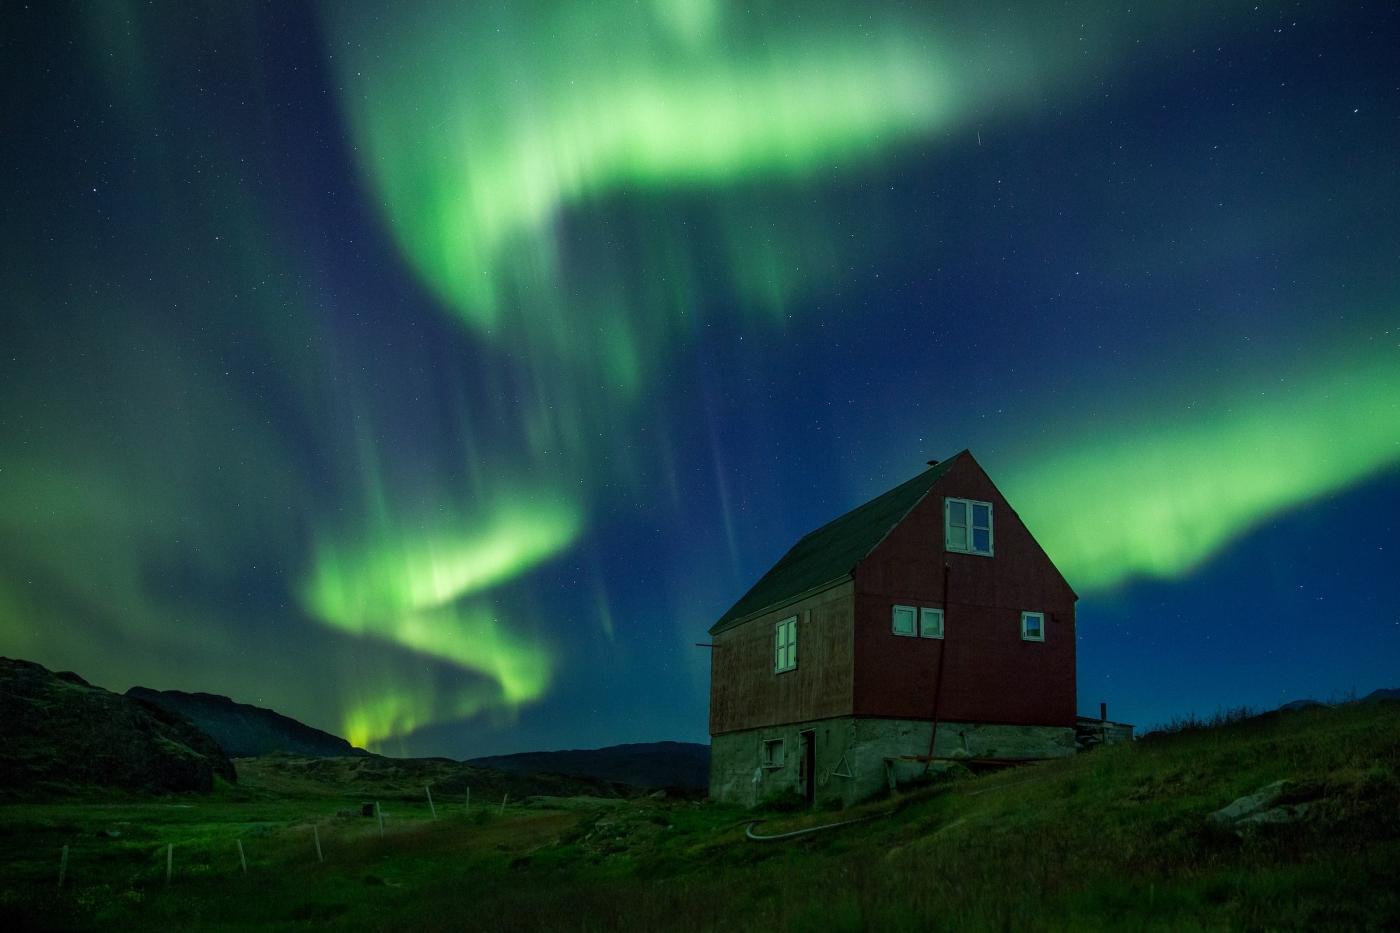 Northern lights over Sermilik Hostel at Tasiusaq sheep farm in South Greenland. By Mads Pihl